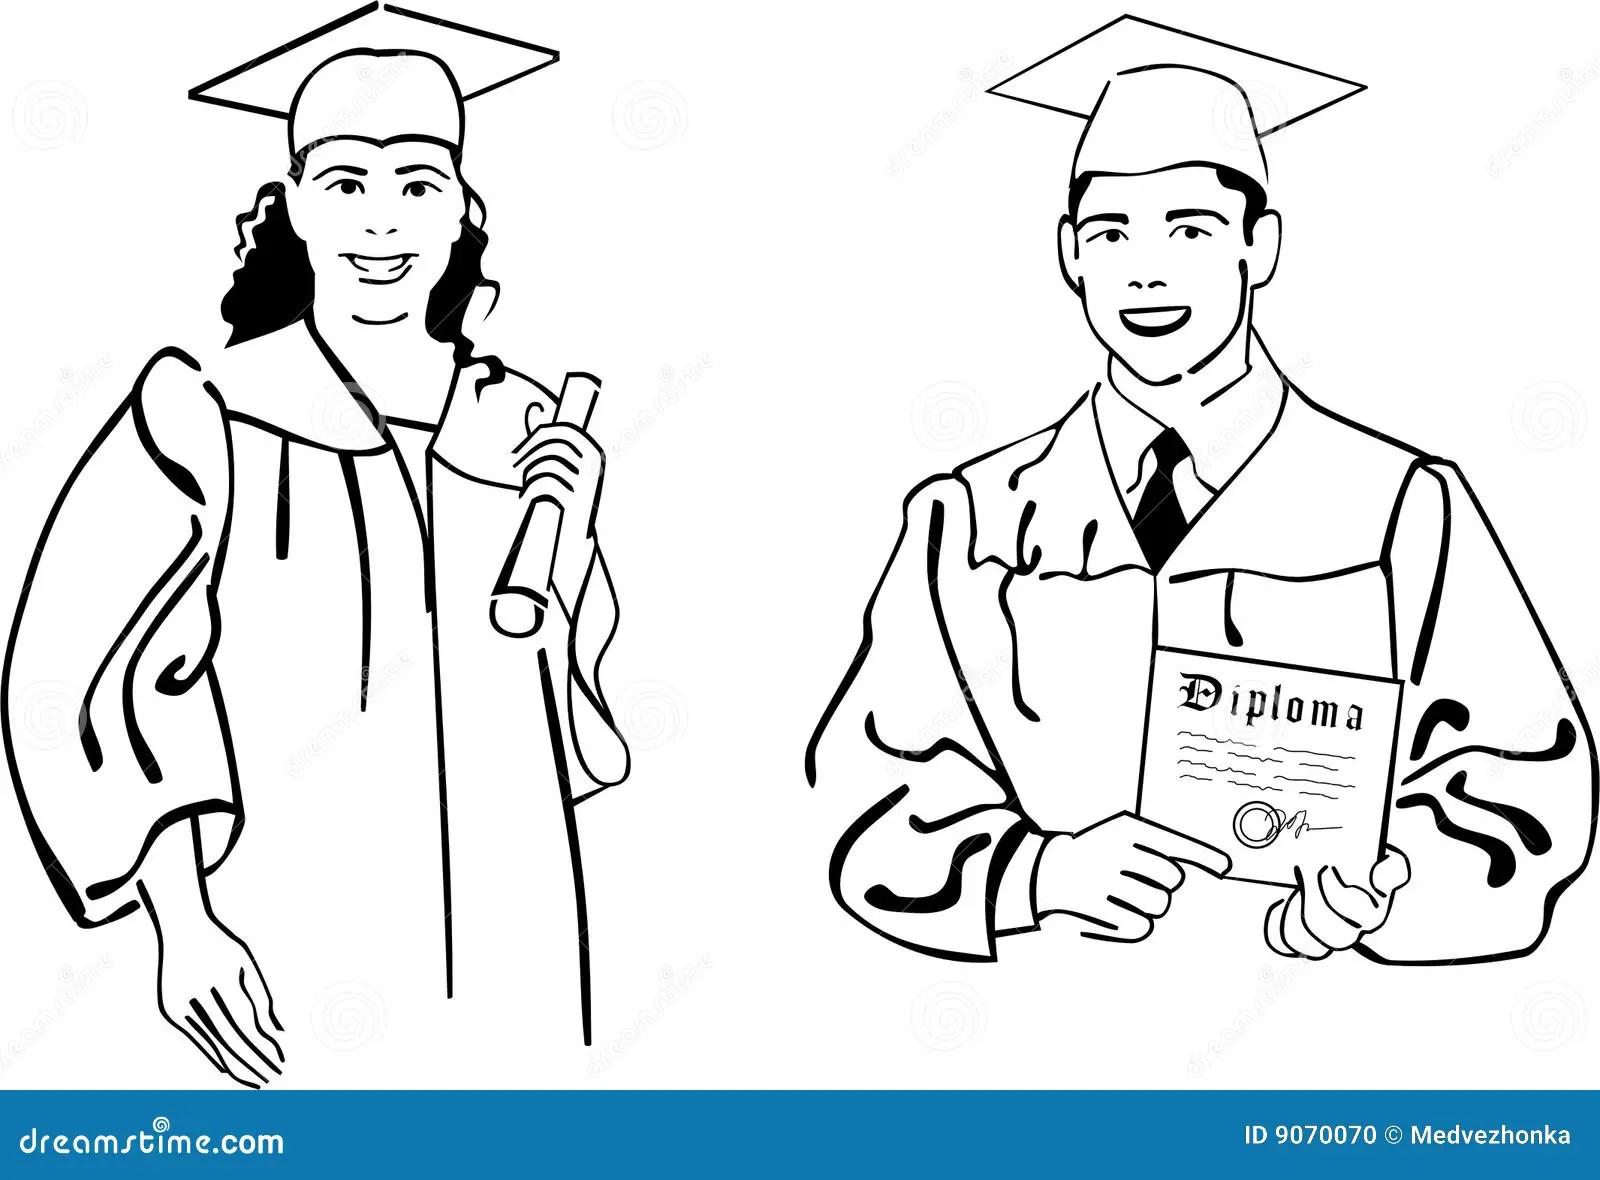 High school graduation stock vector. Illustration of